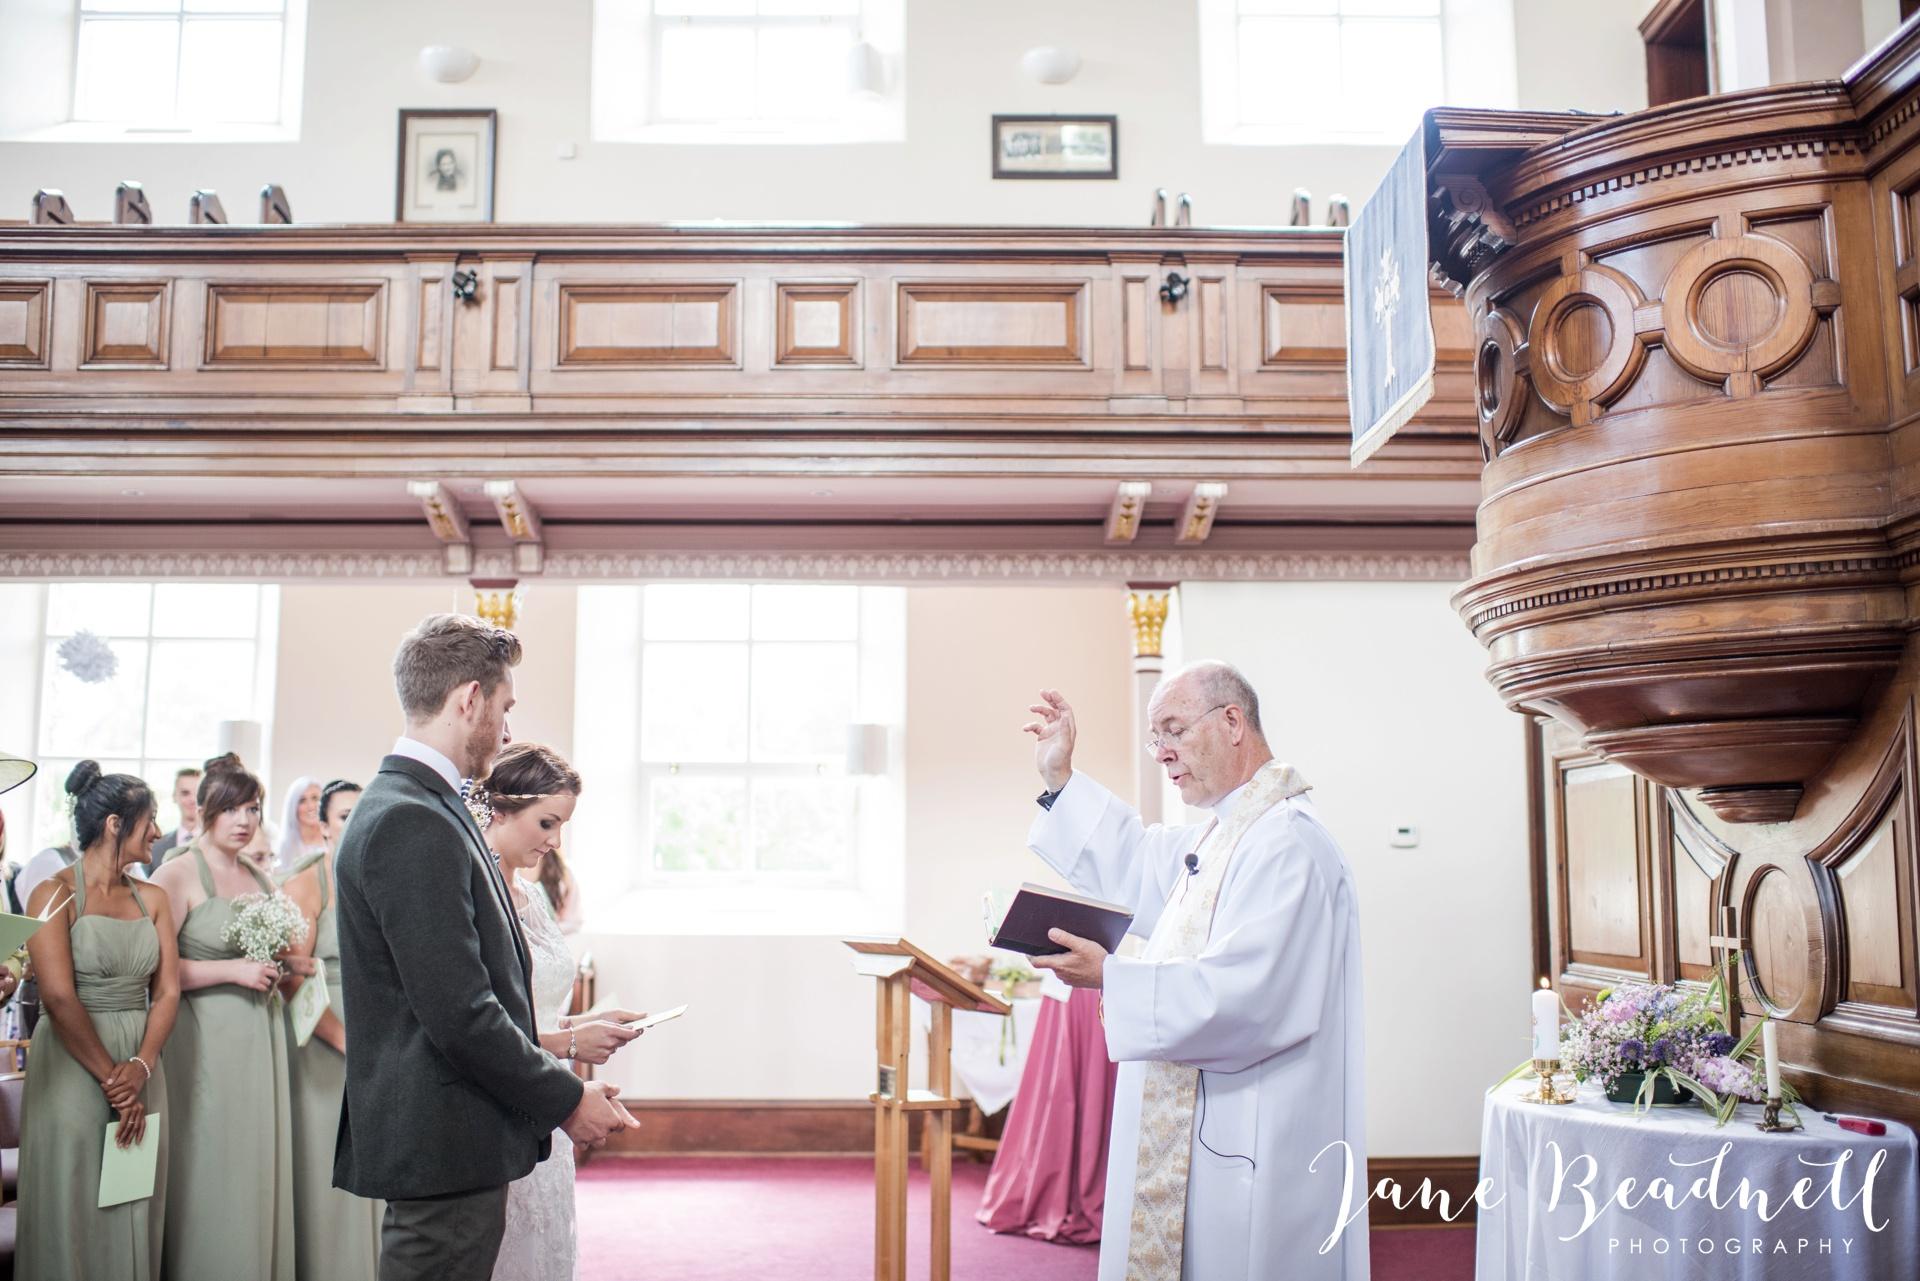 Jane Beadnell fine art wedding photographer The Old Deanery Ripon_0040